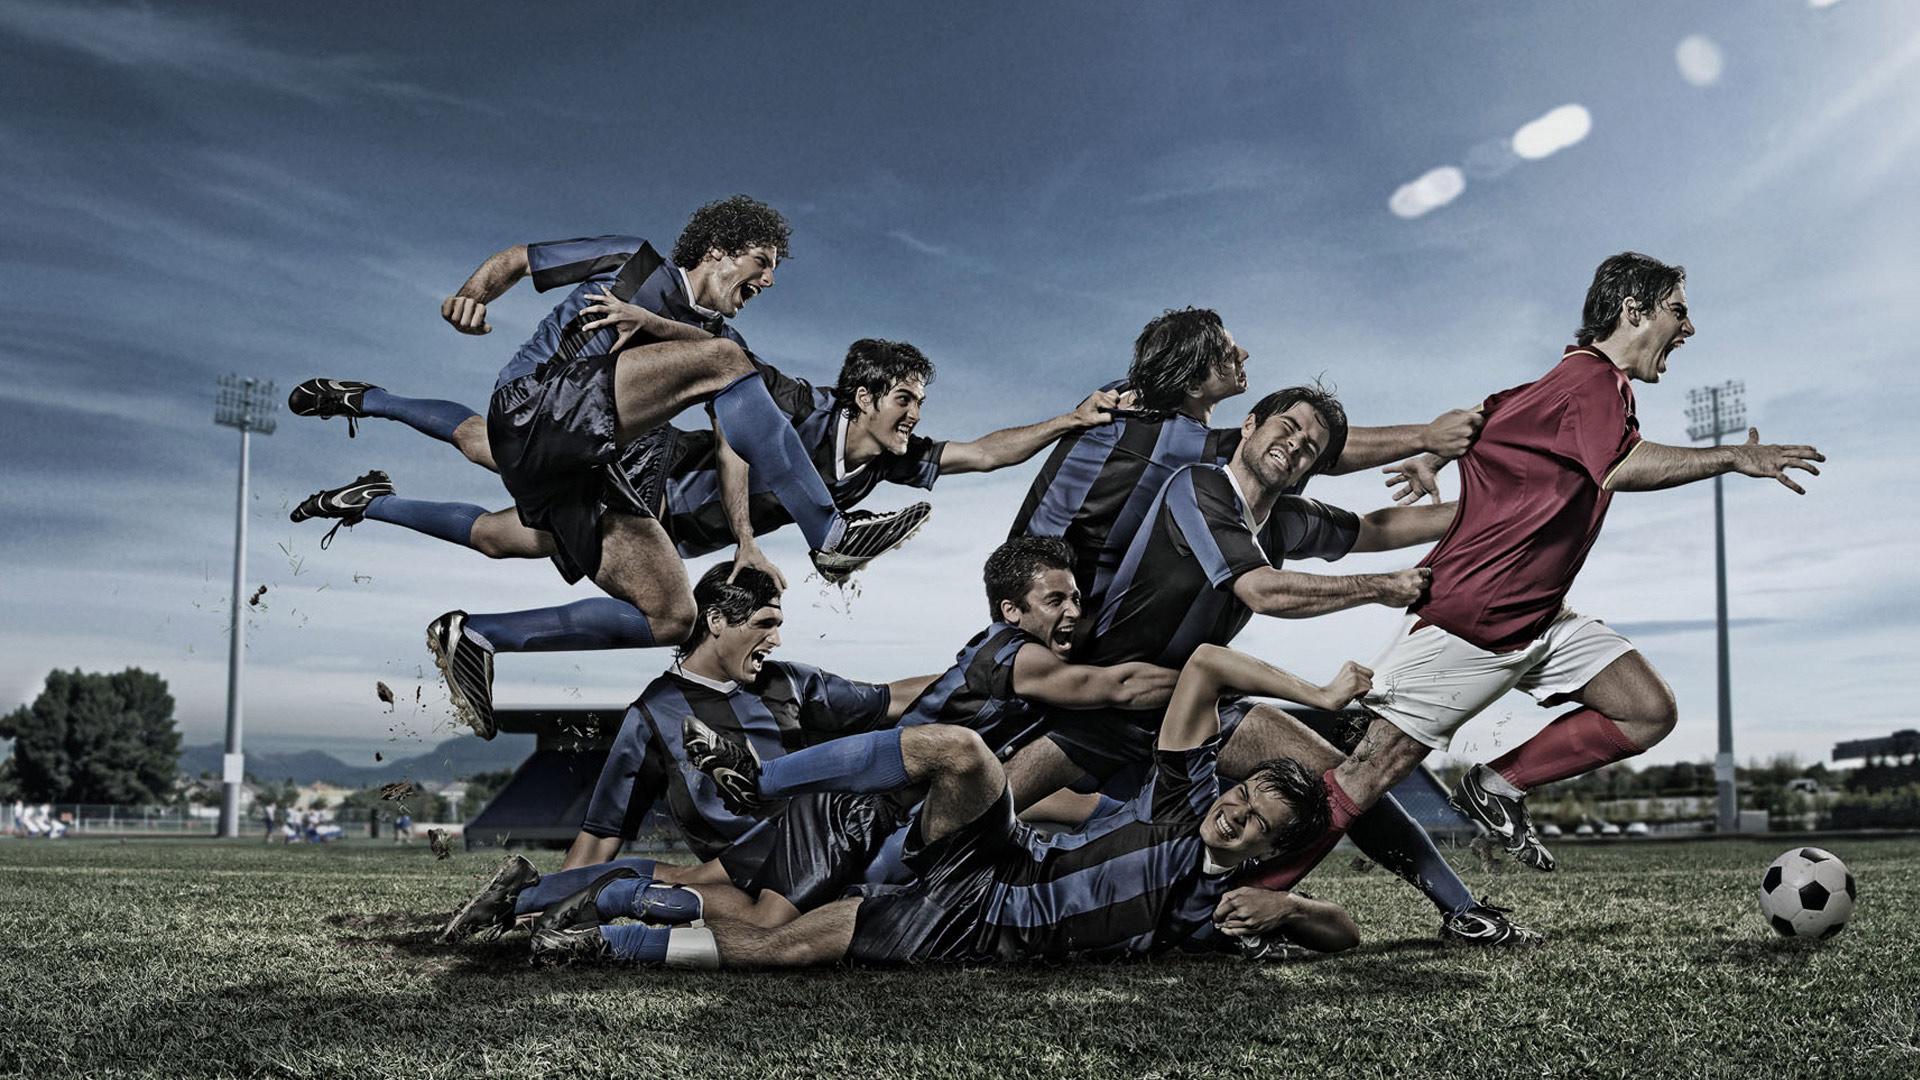 Футболисты, Несколько футболистов ...: www.fullhdoboi.ru/photo/sport/futbolisty/7-0-7457